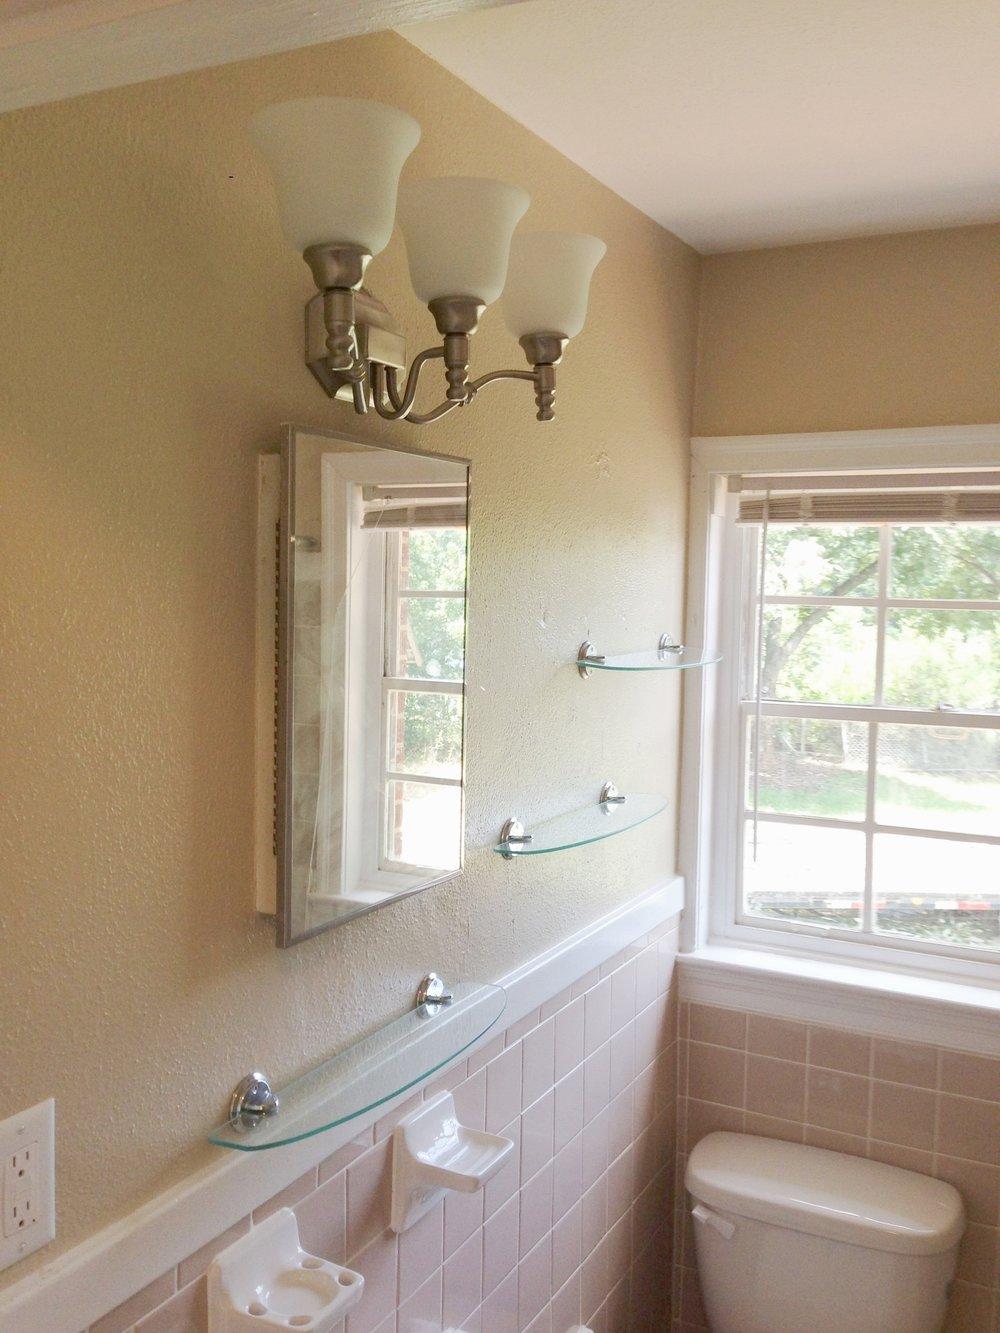 bathroom light fixture.jpg